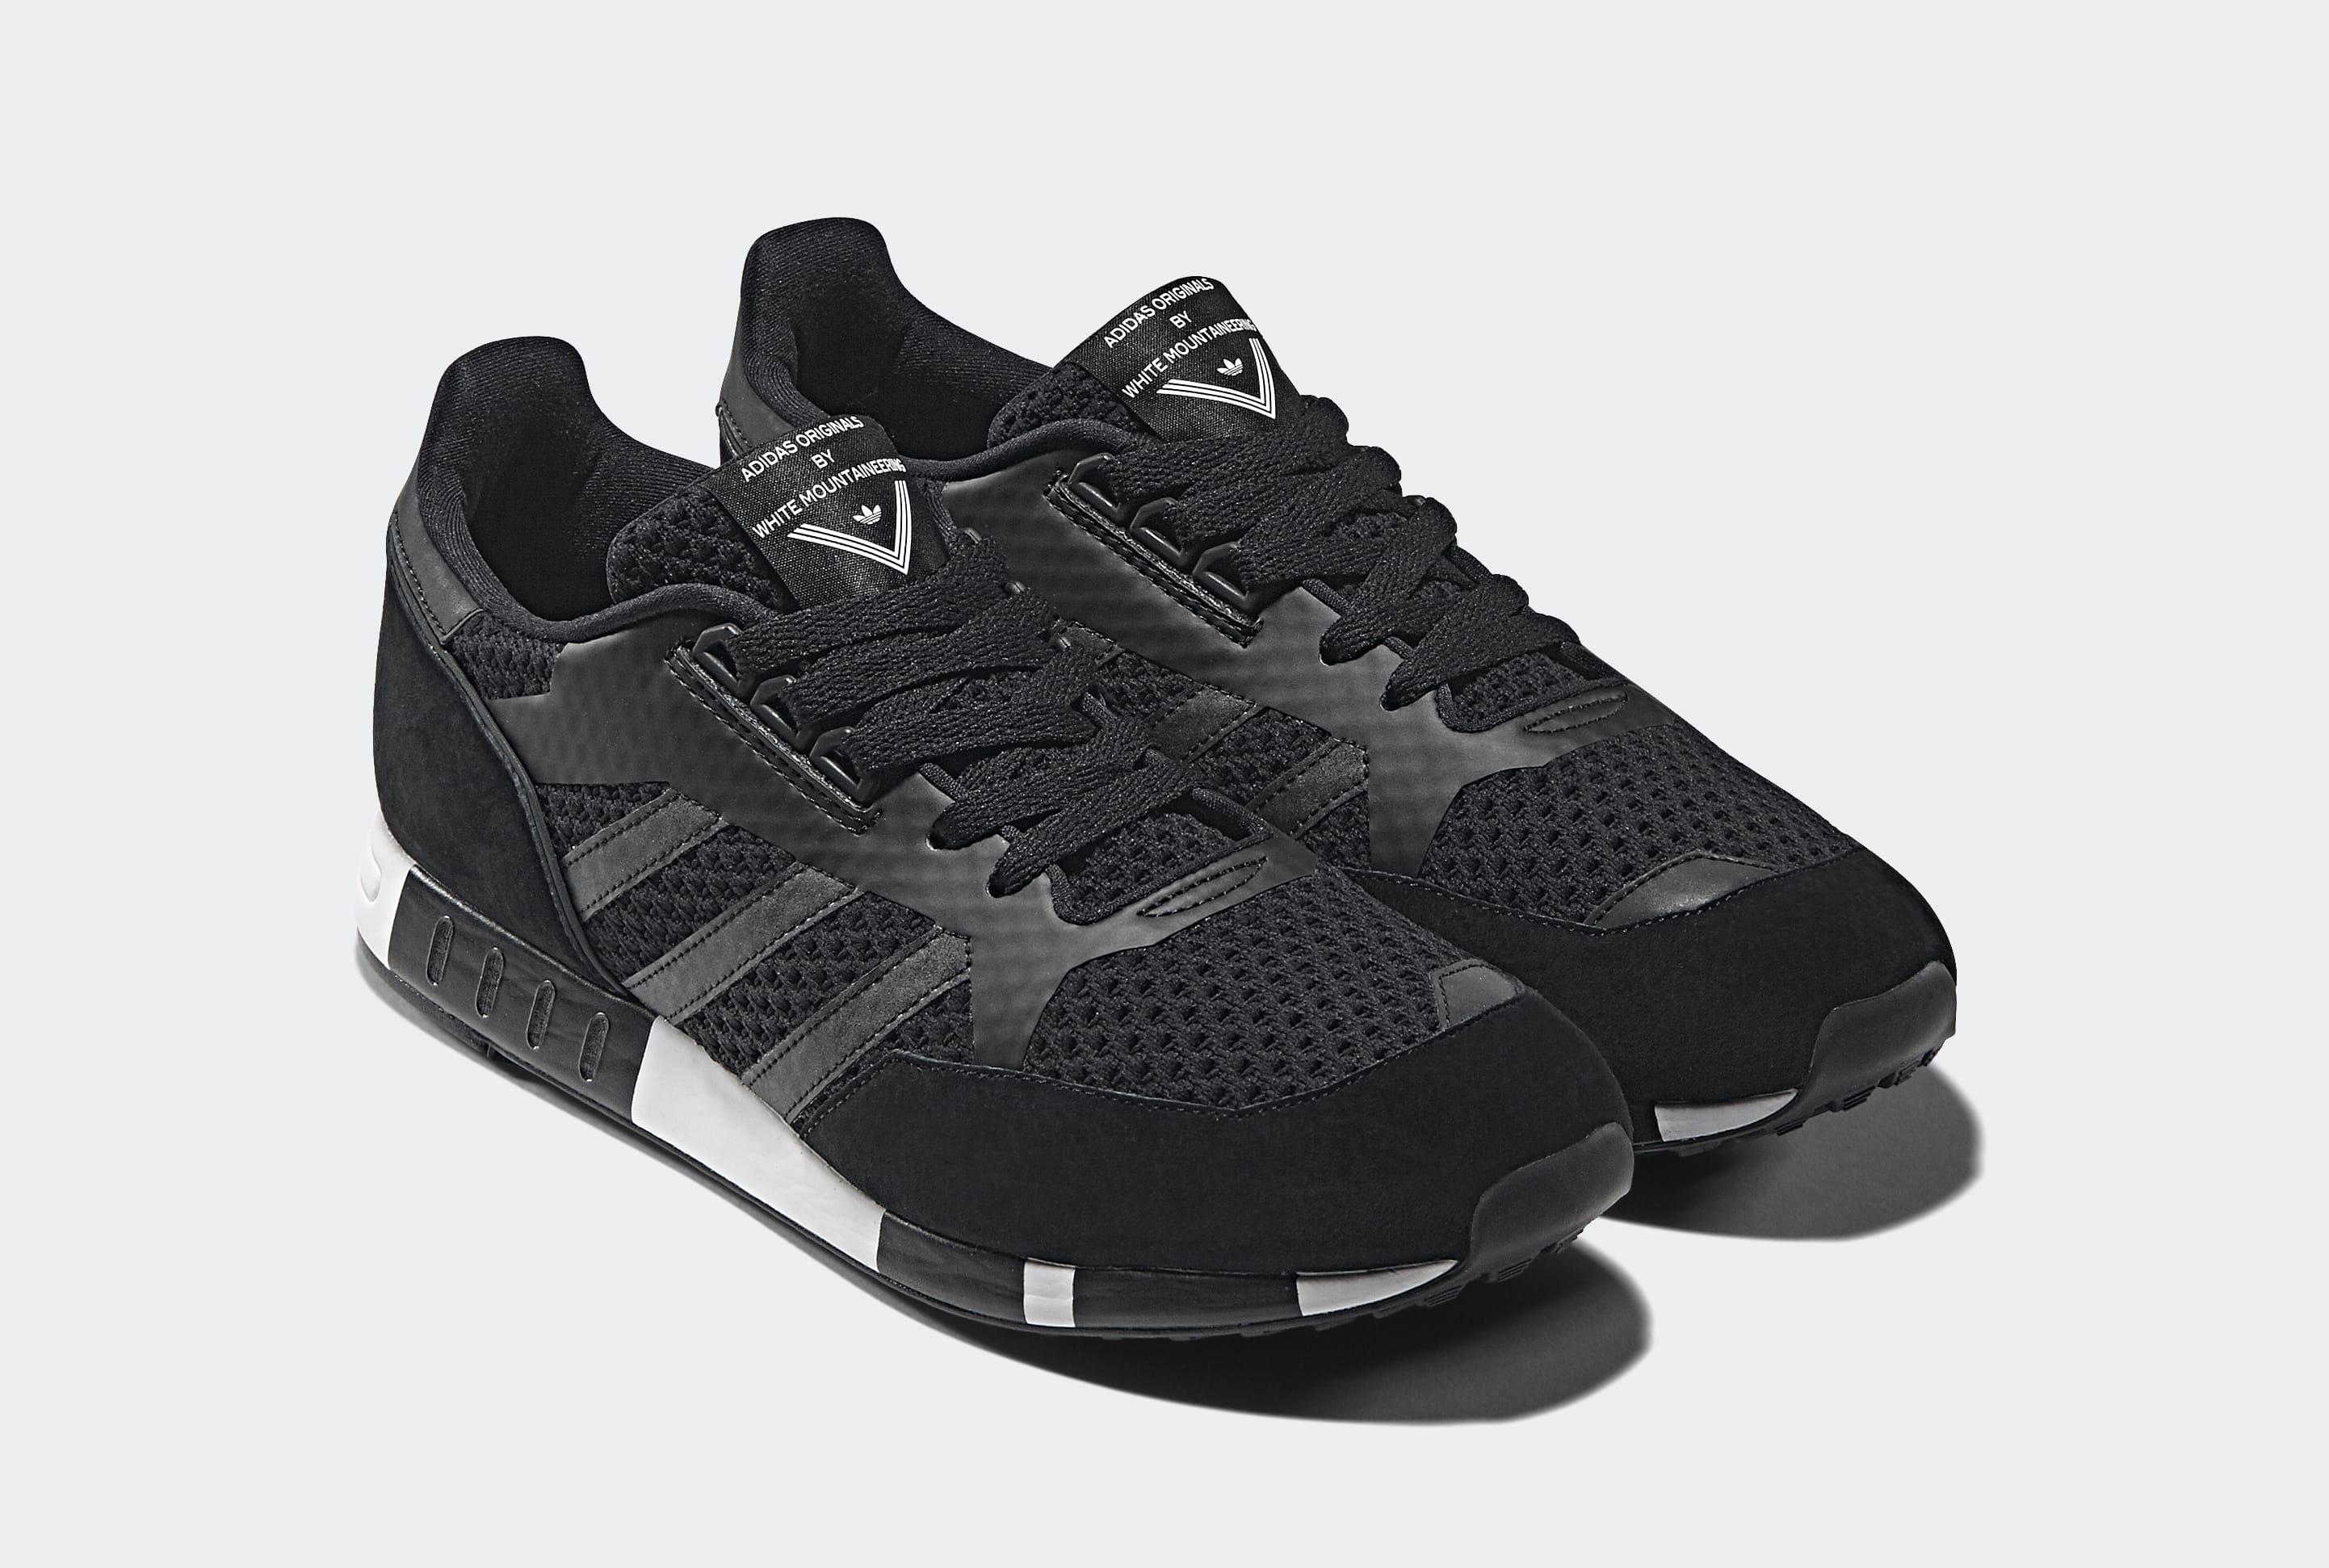 Adidas by White Mountaineering Boston Super Primeknit sneakers - Black